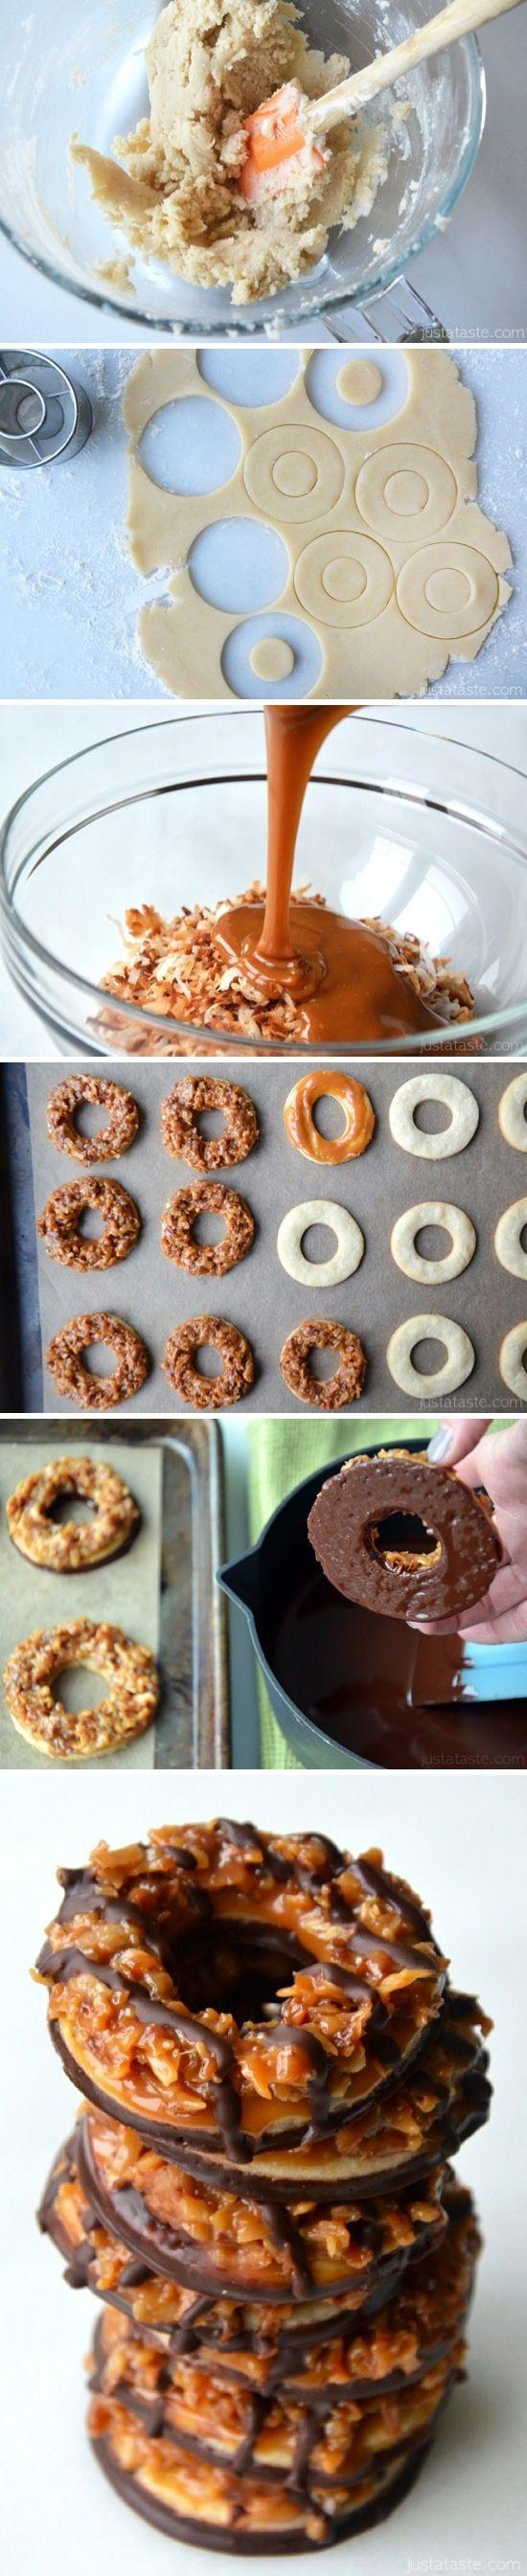 Homemade Samoas Girl Scout Cookies.....whaaaaaat?